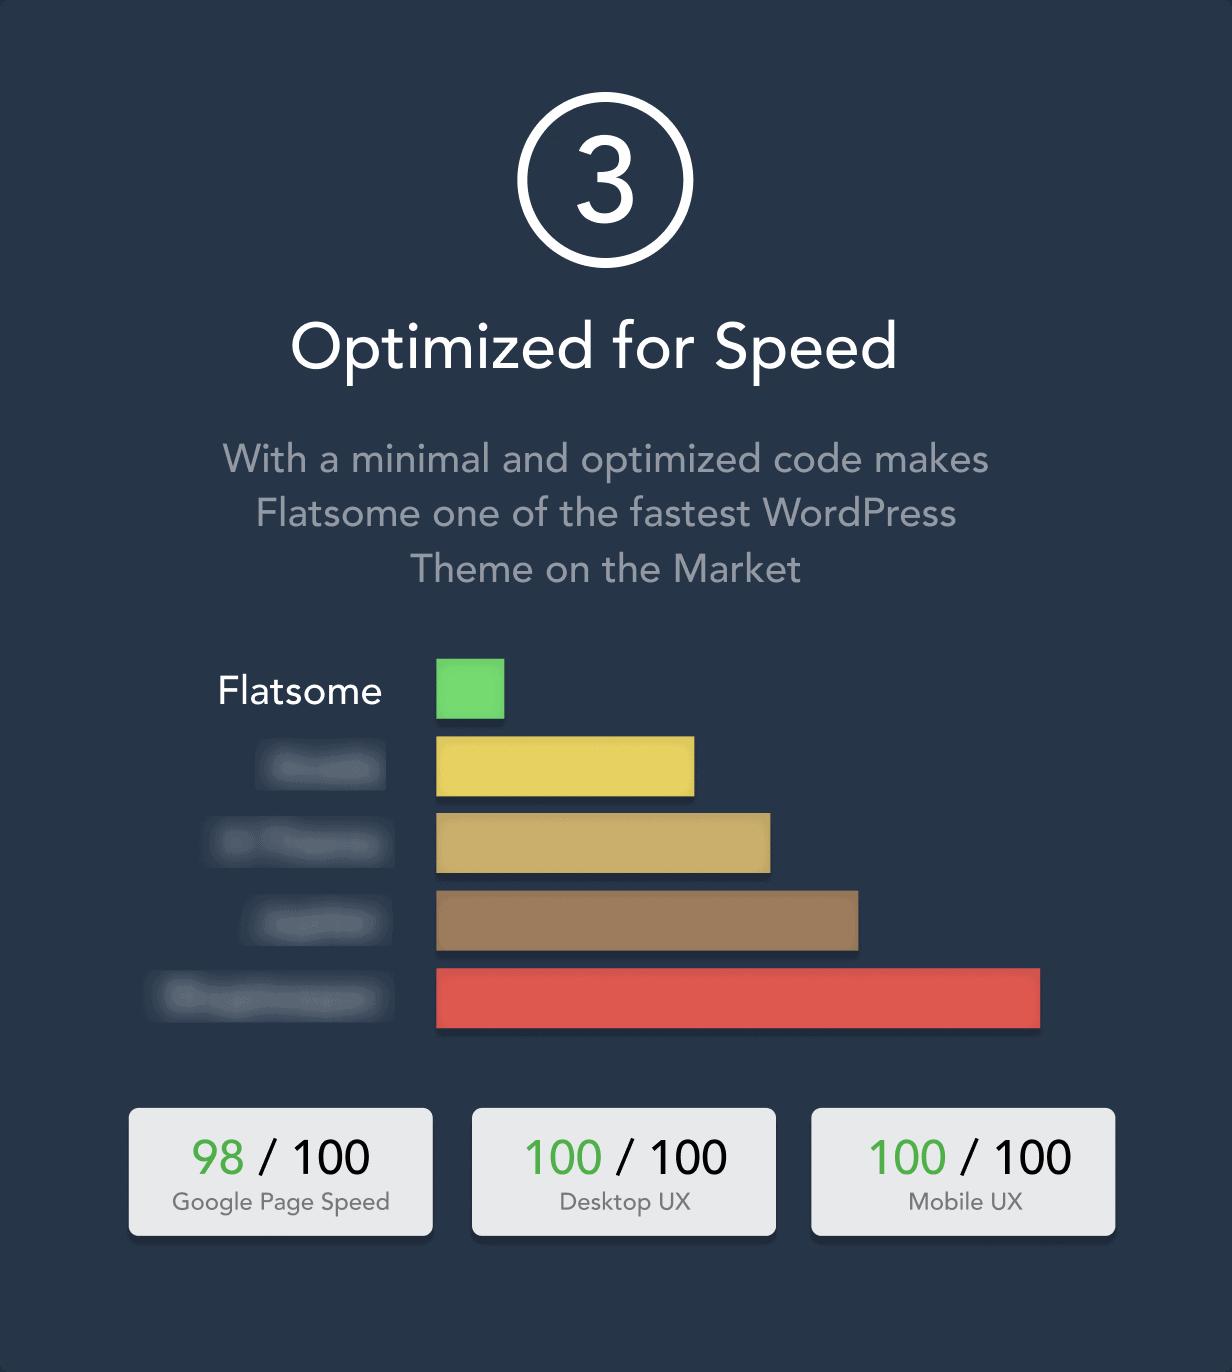 Flatsome optimize for speed web template -  Themeforest wordpress theme